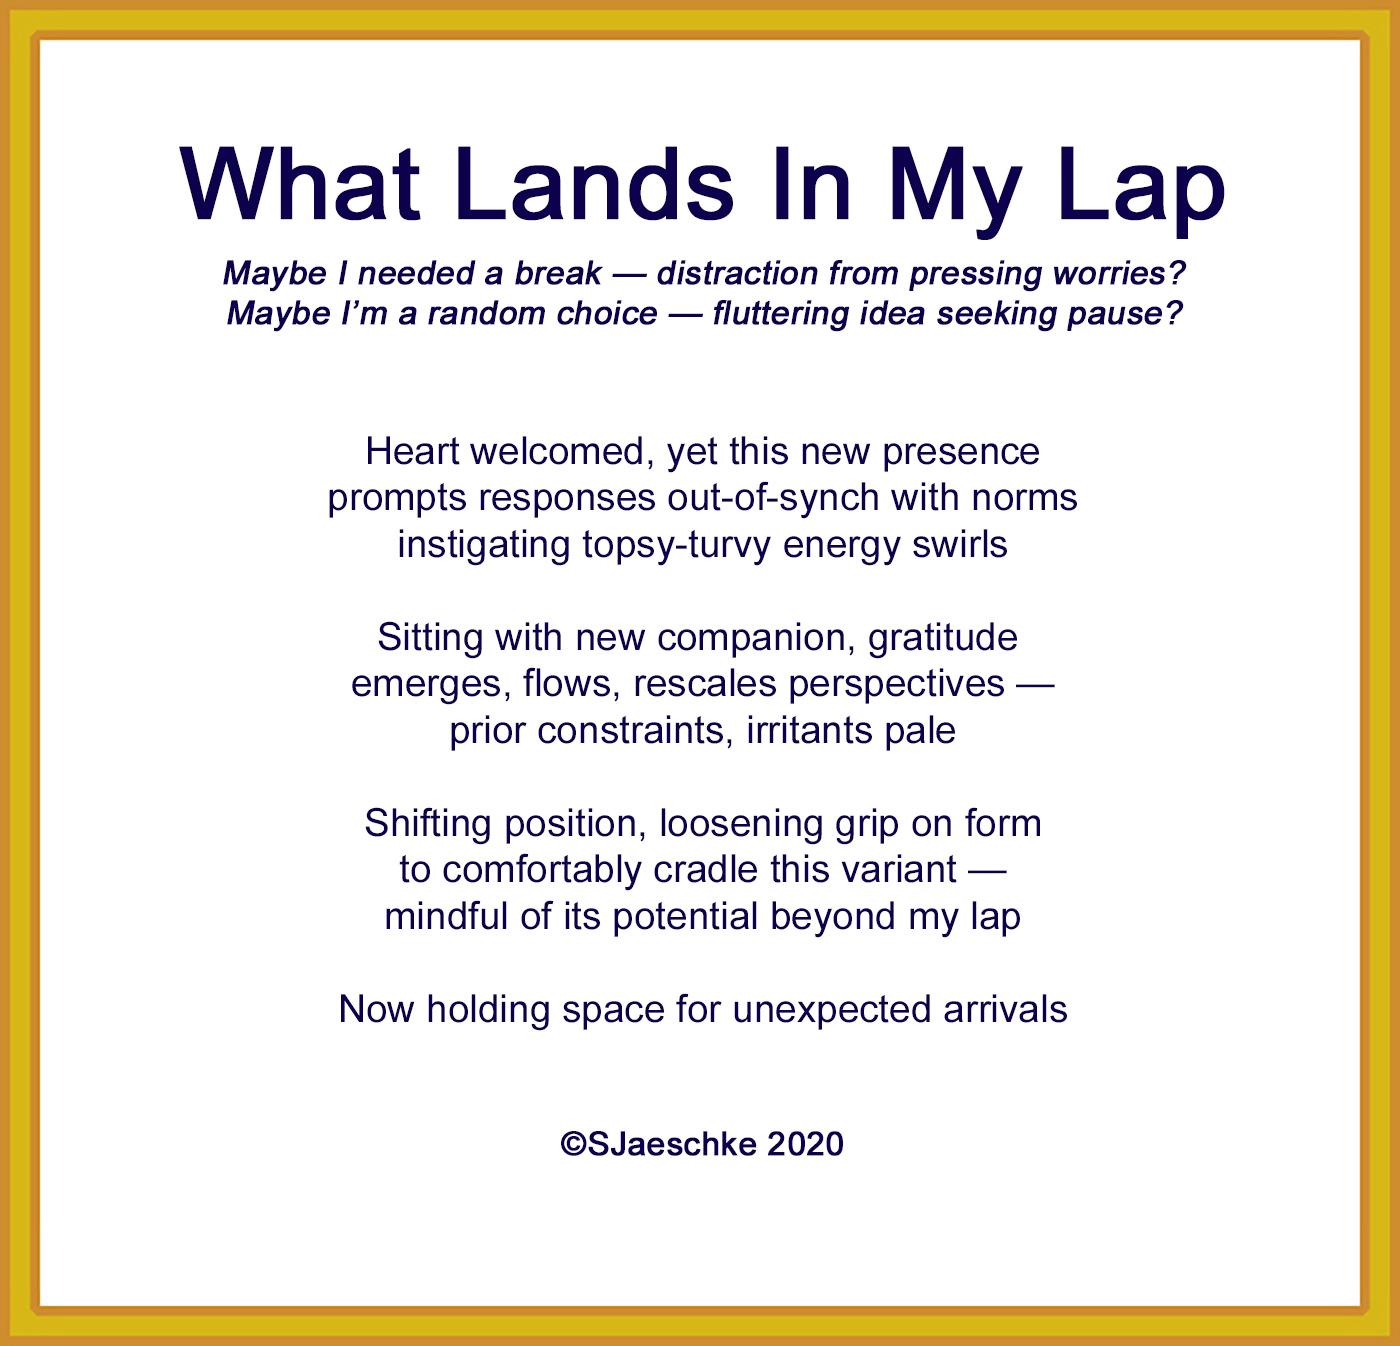 Post_2020-05-01_Poem_WhatLandsInMyLap